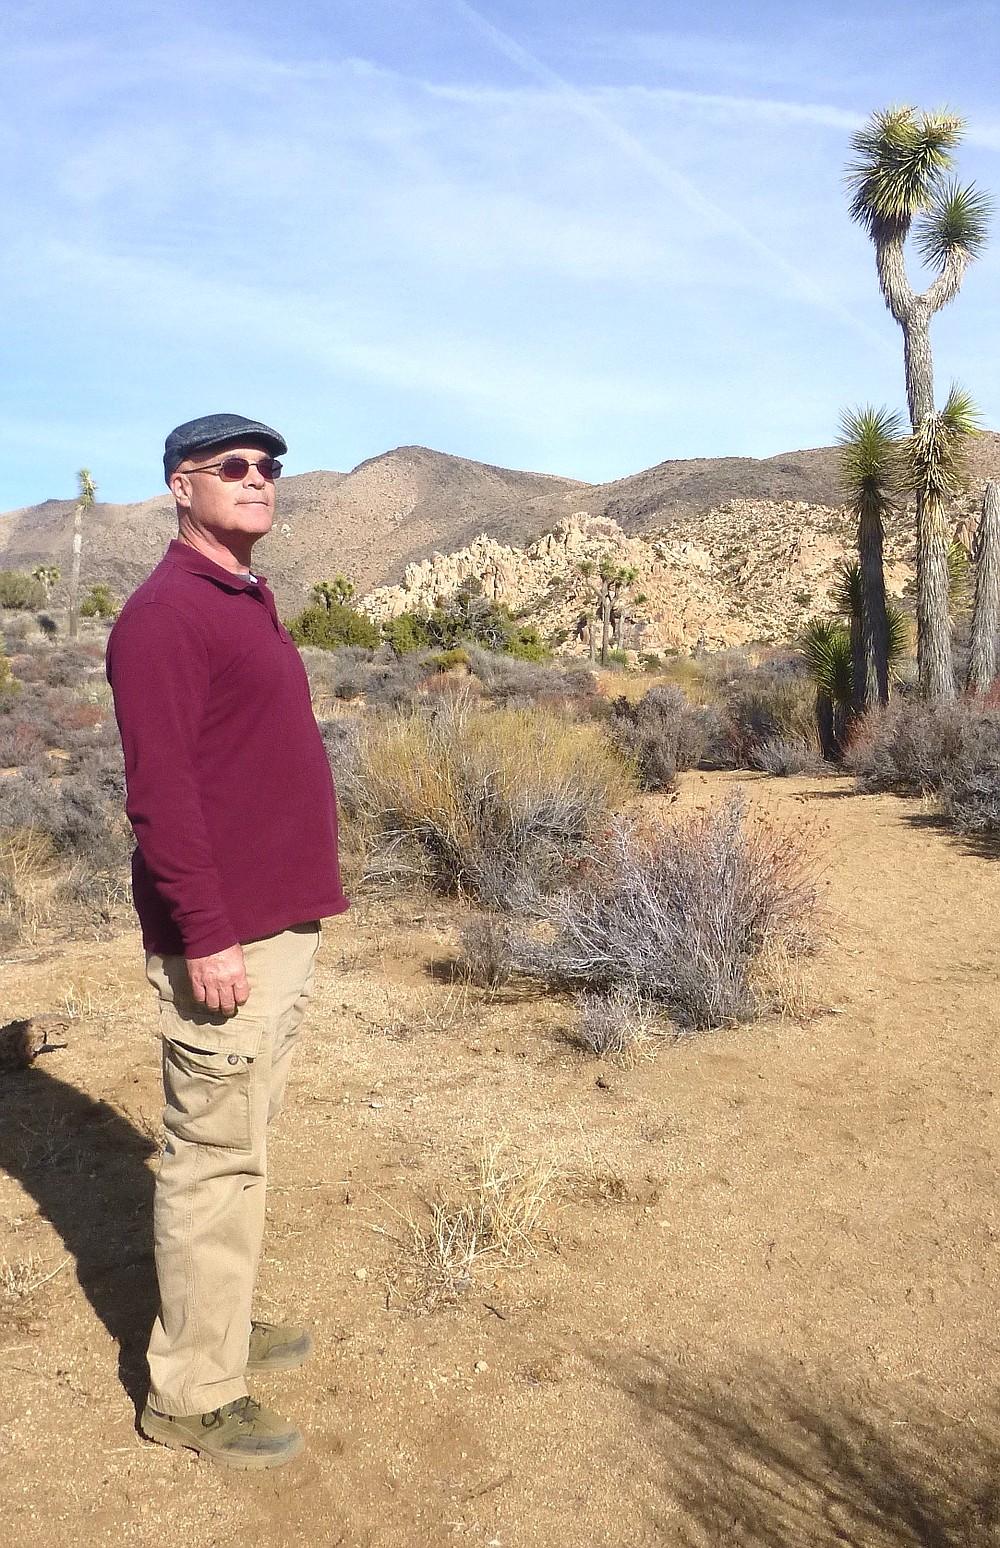 Bob Craig on a hike in Joshua Tree National Park